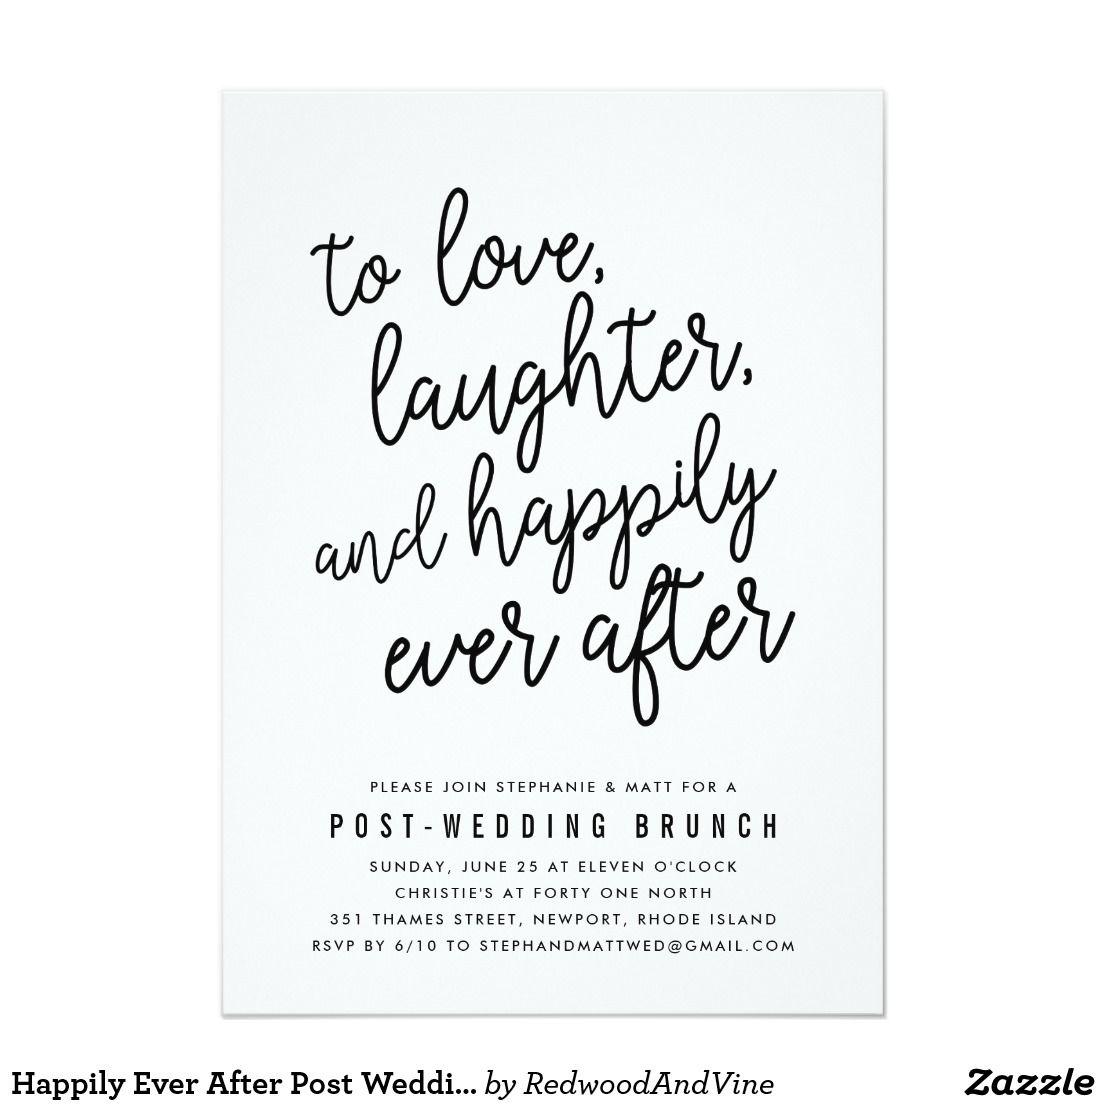 Happily Ever After Post Wedding Brunch Invitation | Pinterest ...